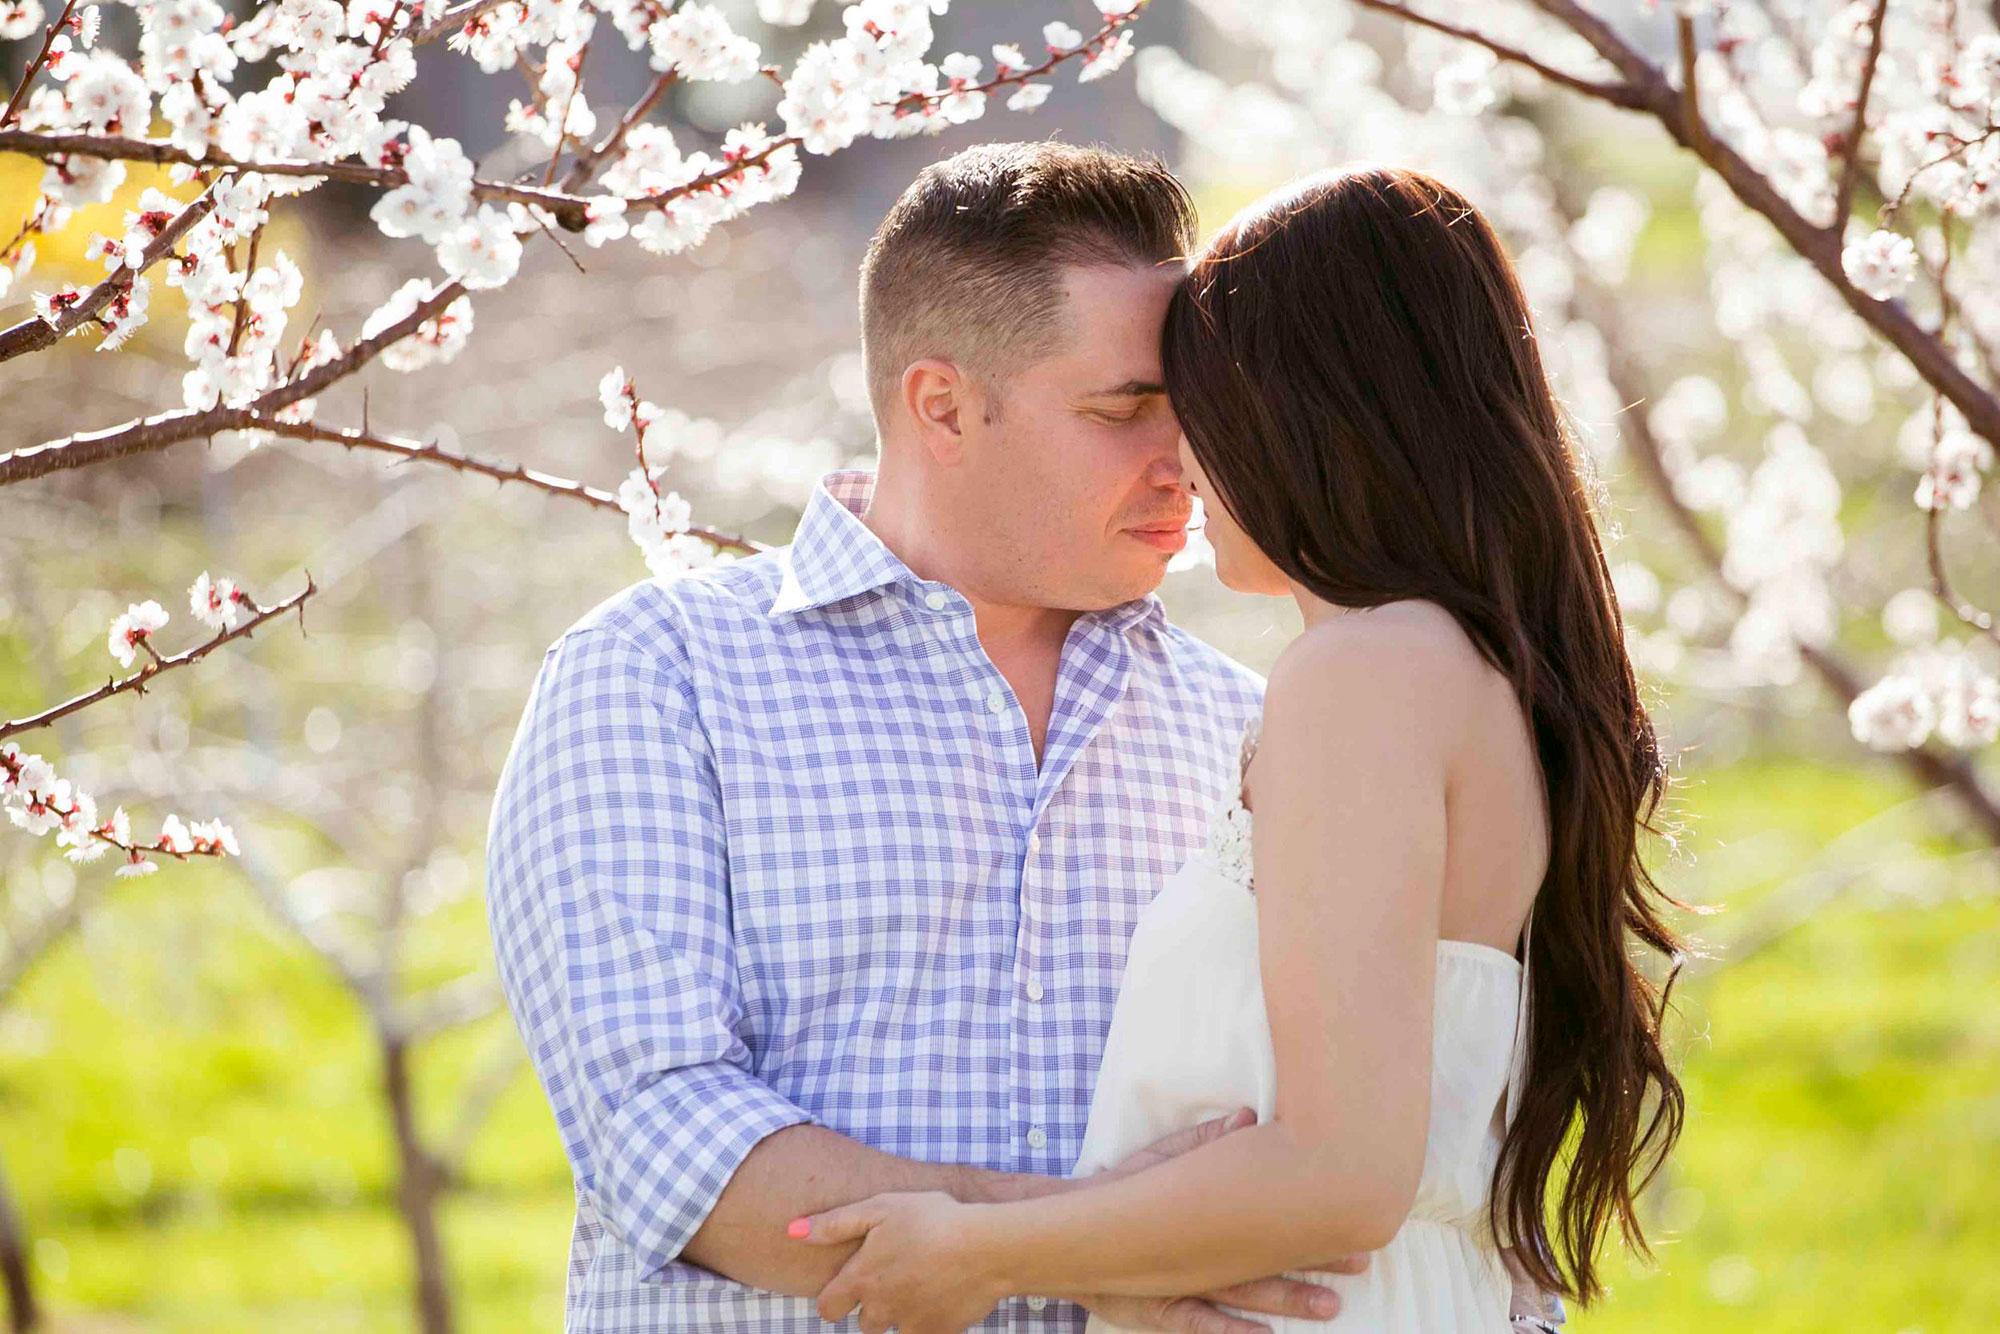 Niagara-on-the-Lake-Engagement-Vineyard-Bride-Photo-By-Gemini-Photography-003.jpg